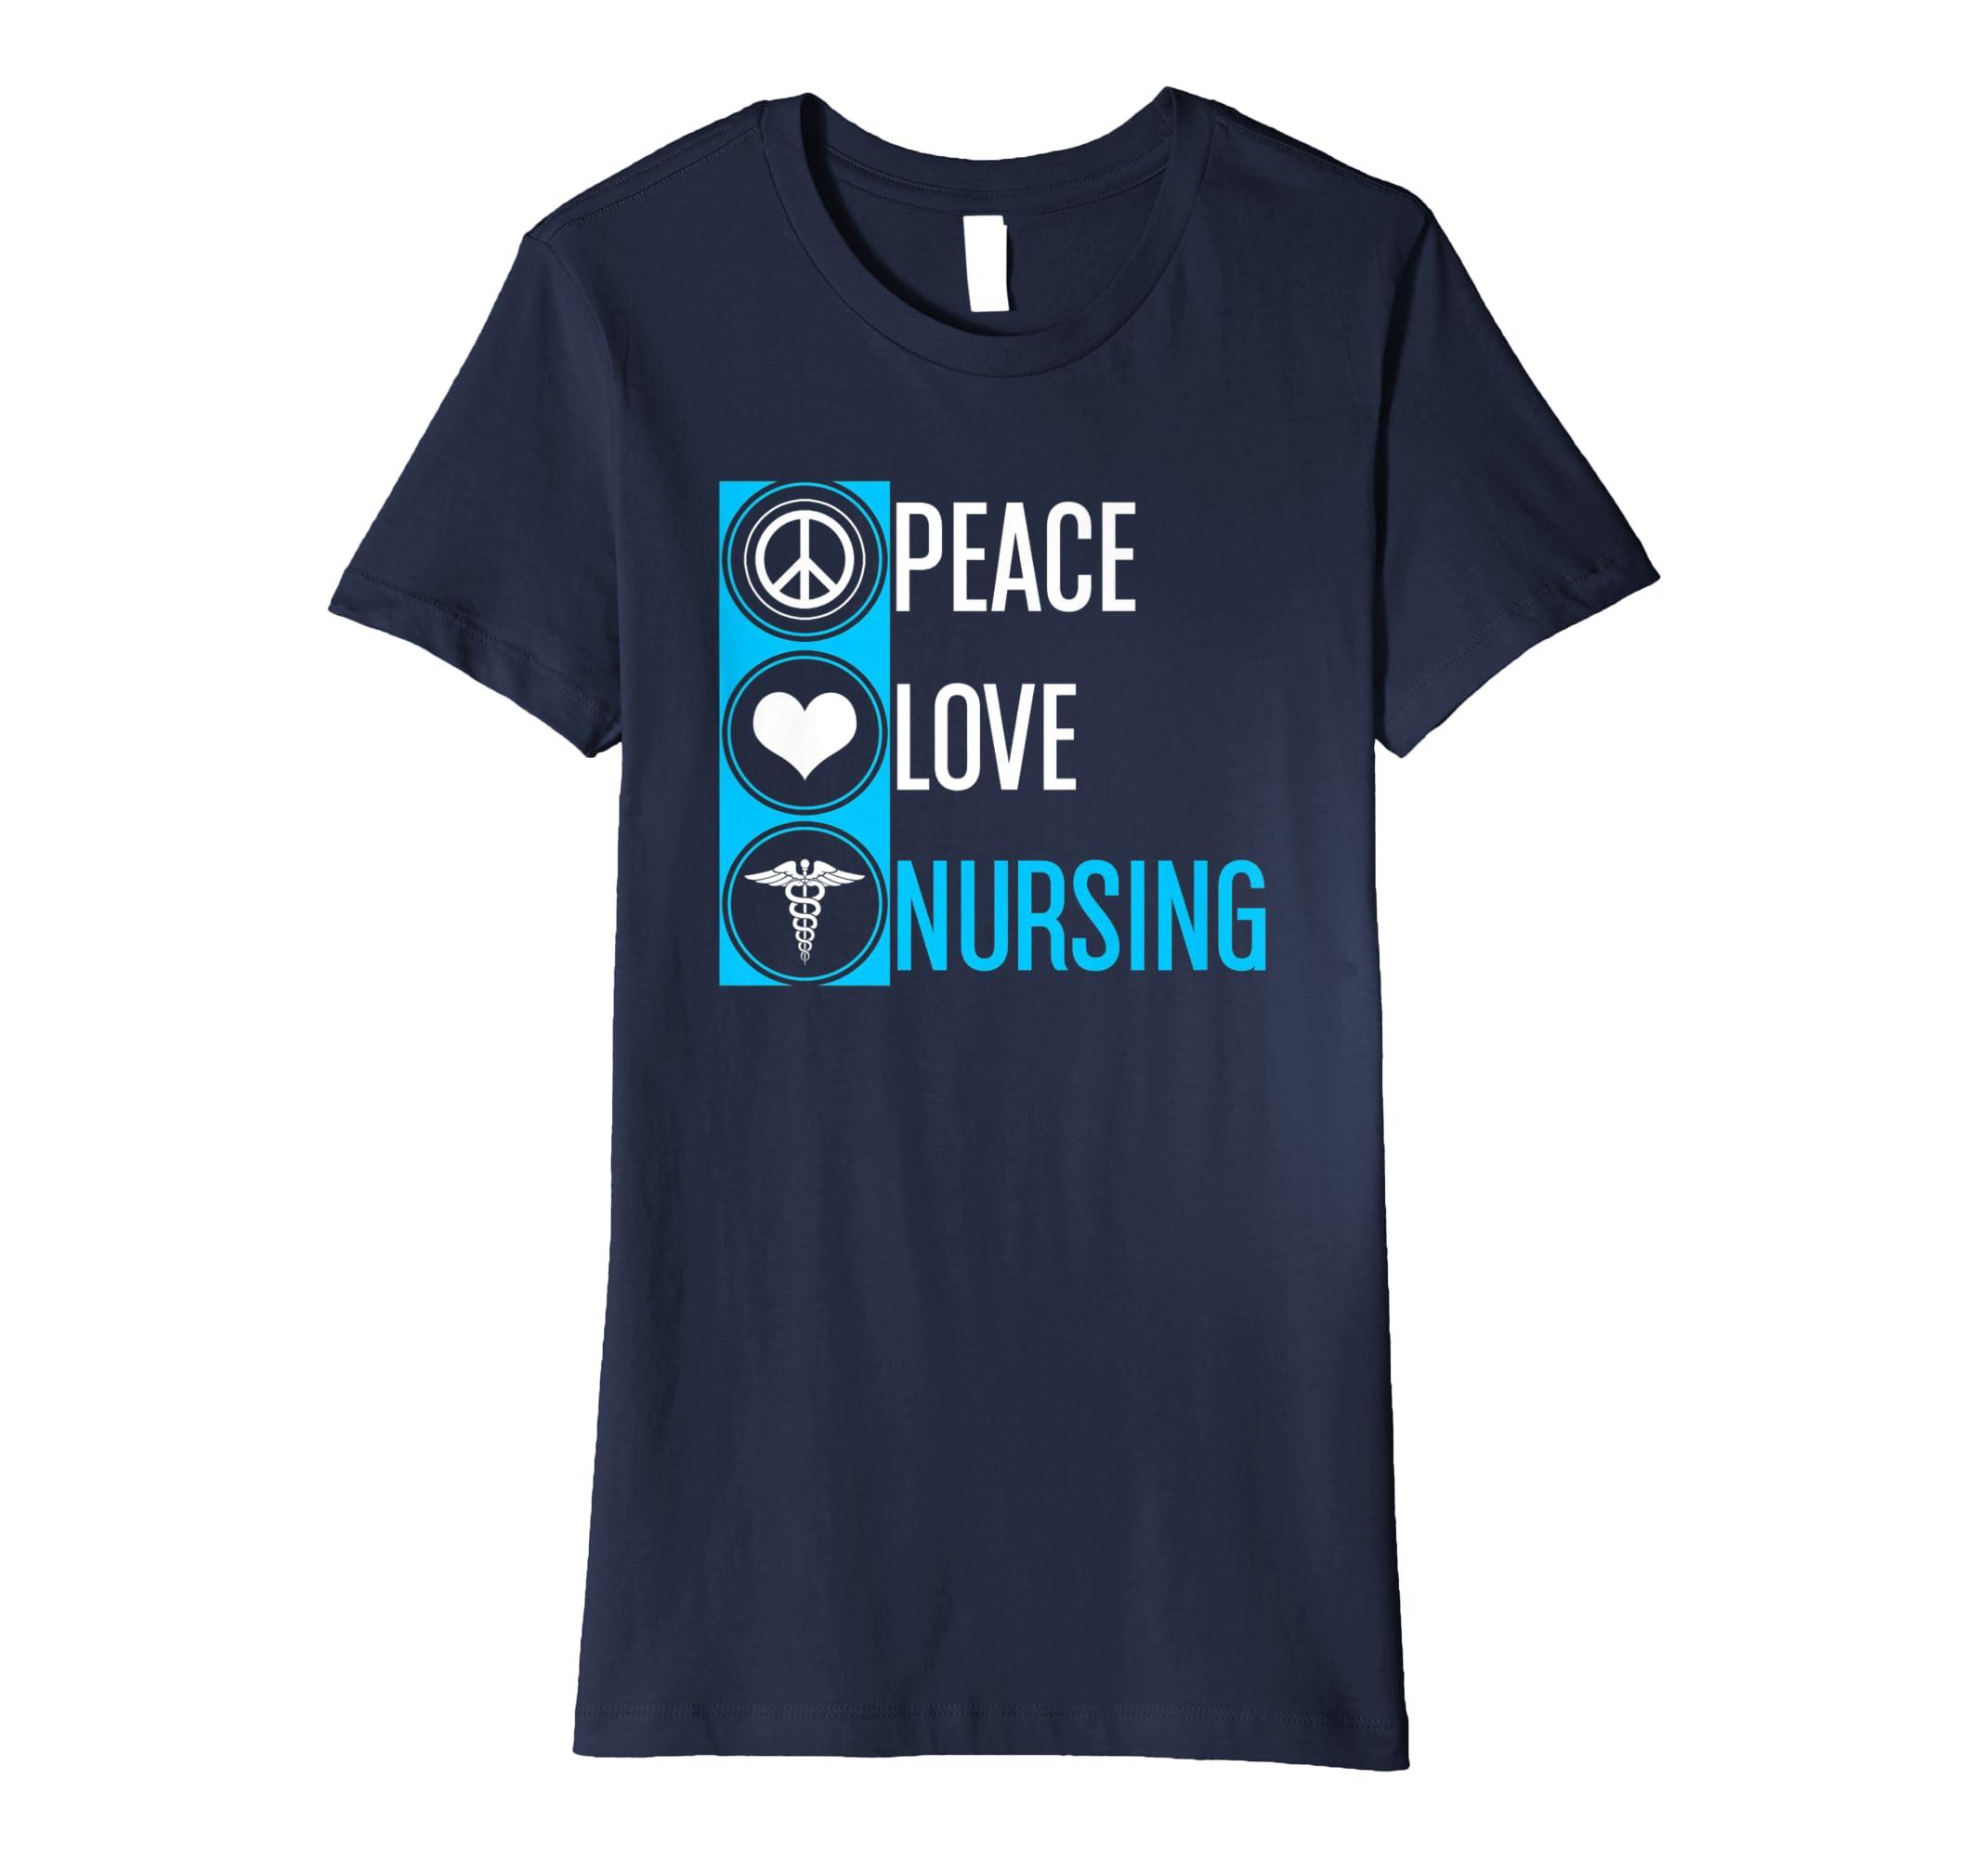 8202bcac76a13 Amazon.com: PEACE LOVE NURSING Shirt For Nurses,Gift For Nurse,RN Shirt:  Clothing